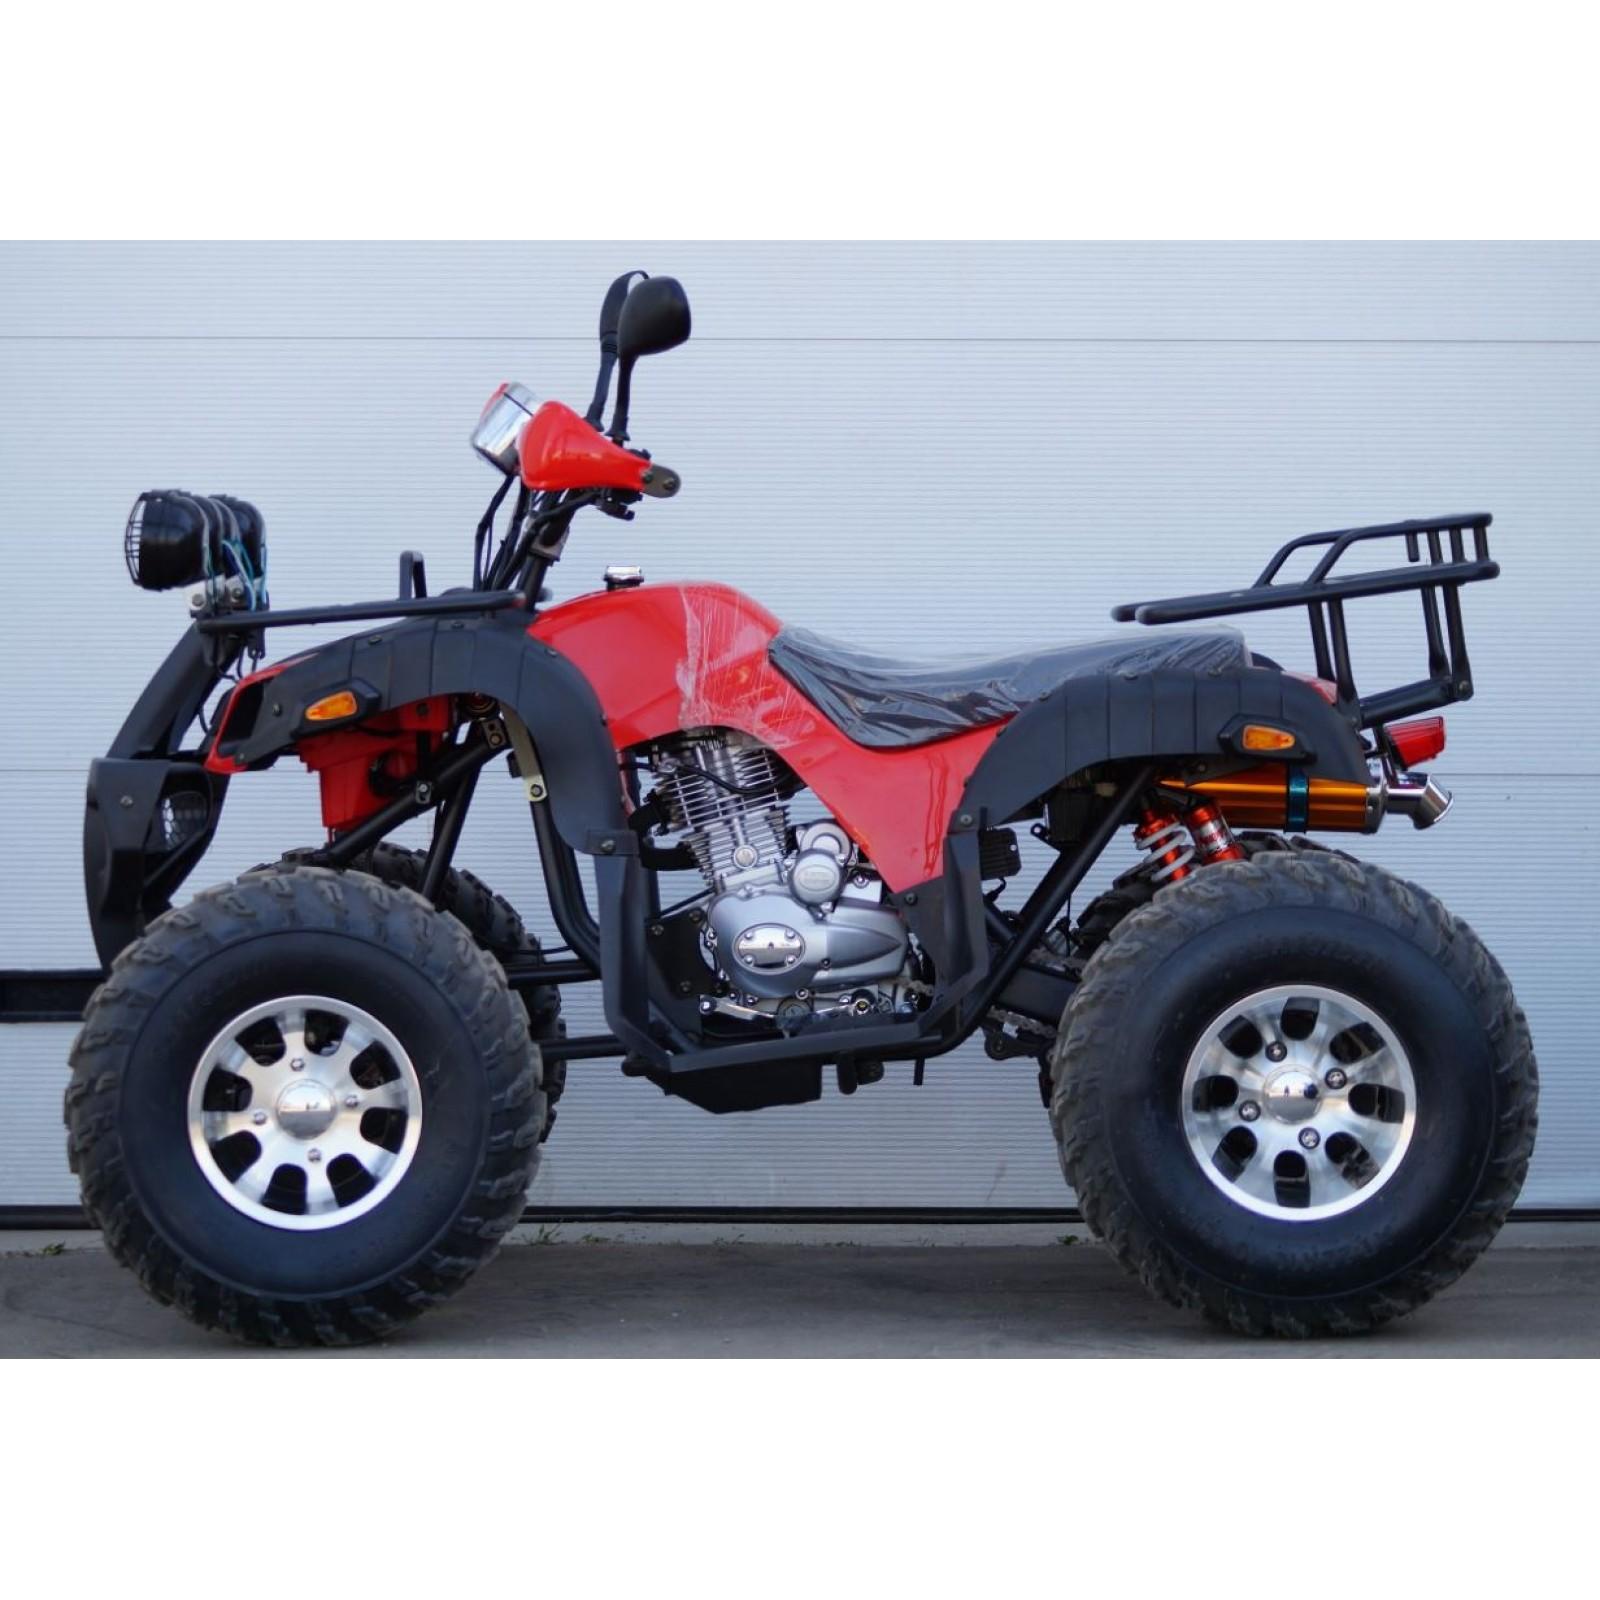 Квадроцикл Stalker-250 LUX